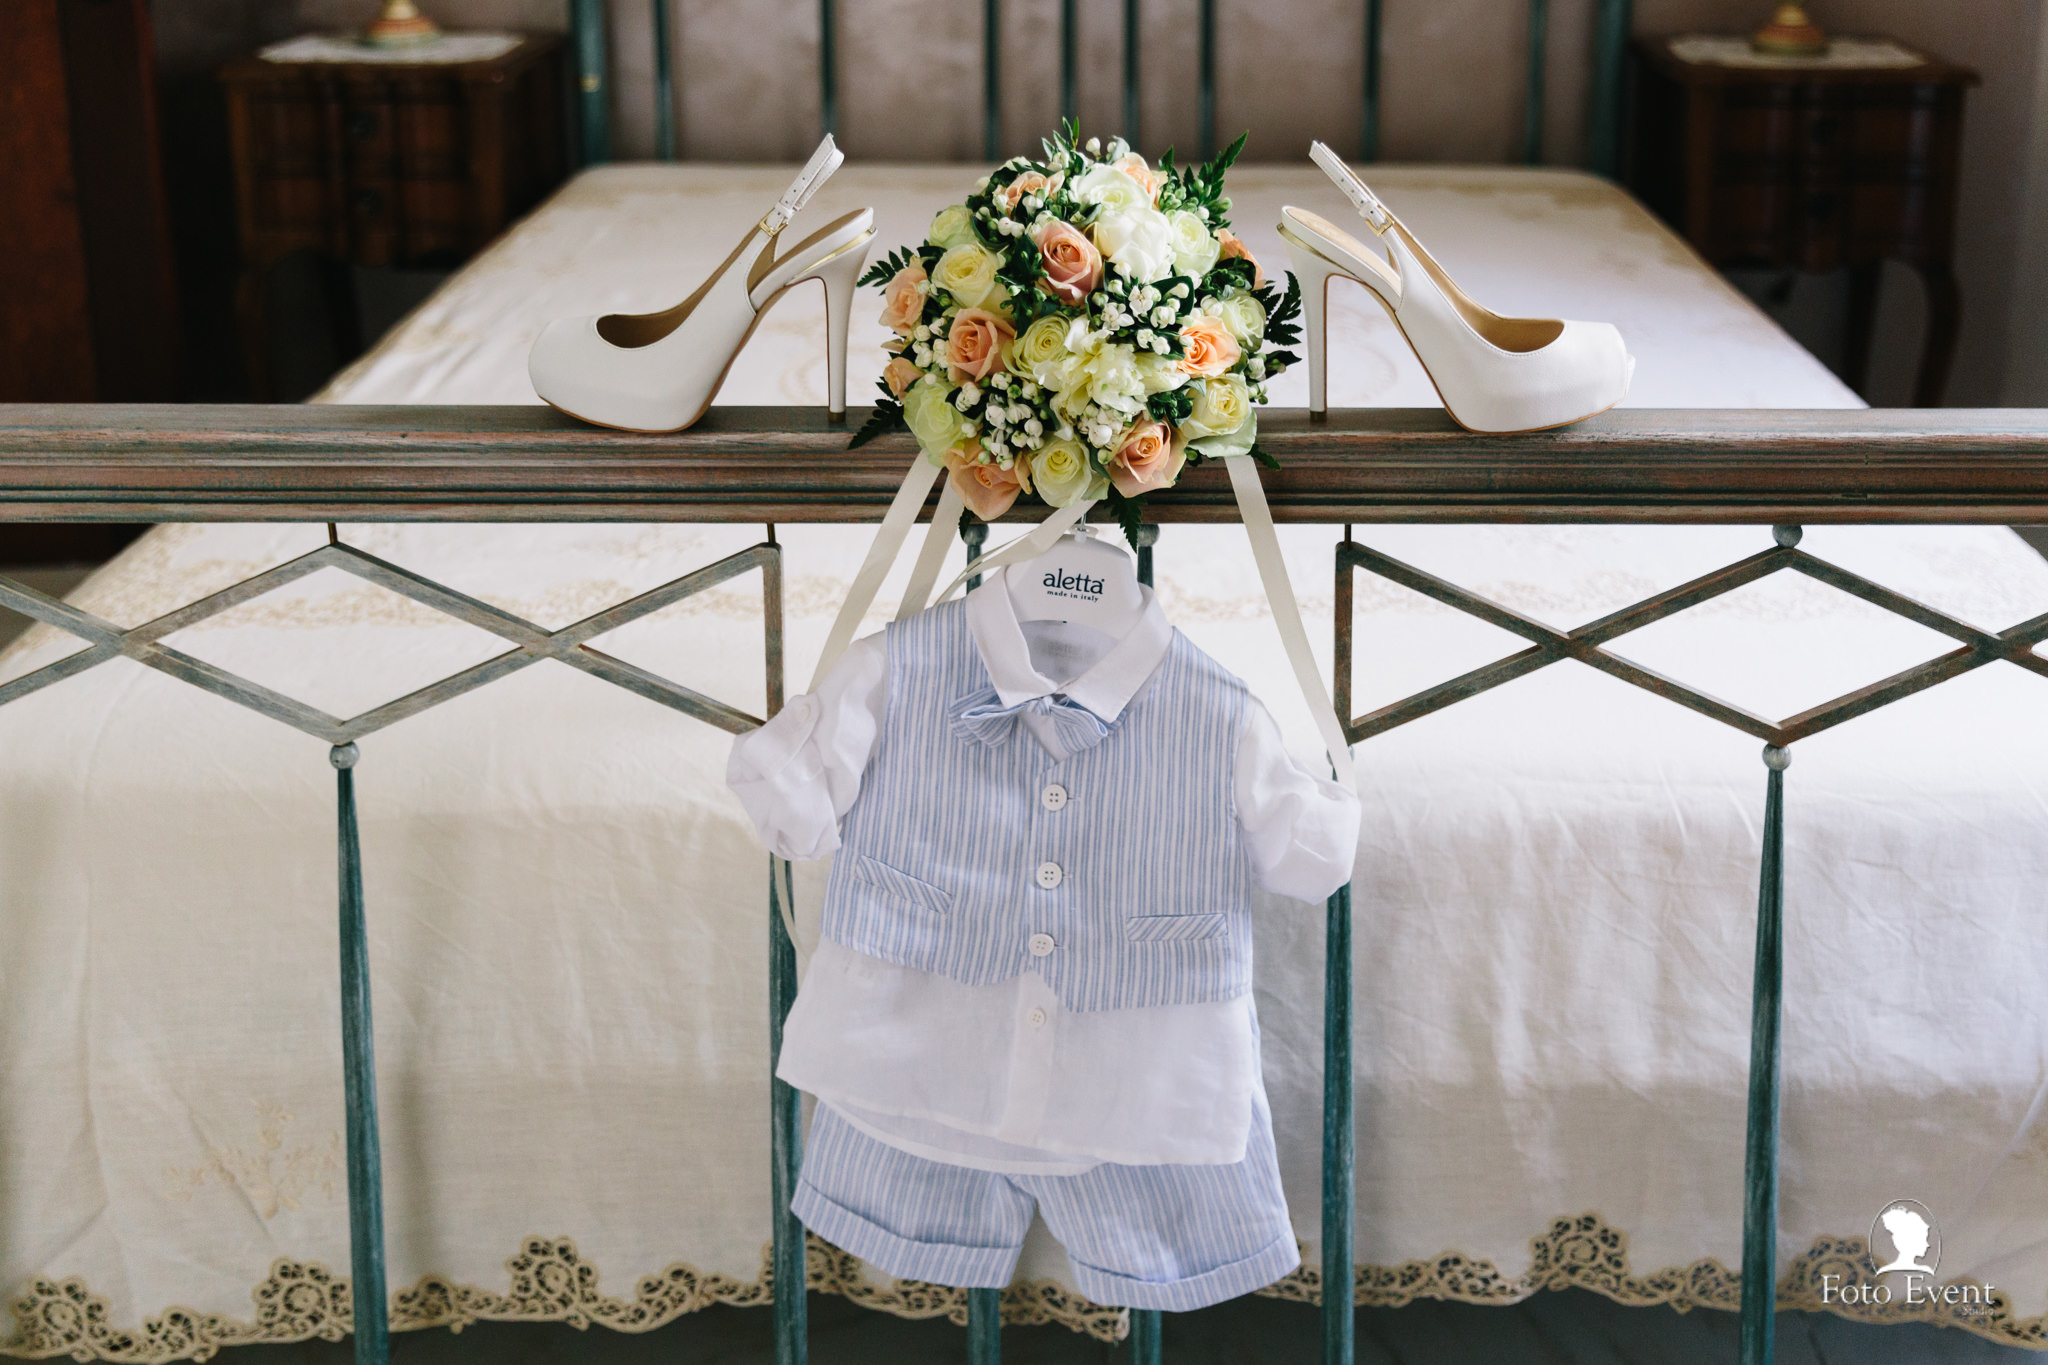 015-2019-08-31-Matrimonio-Serena-e-Saverio-Tarantino-5DE-387